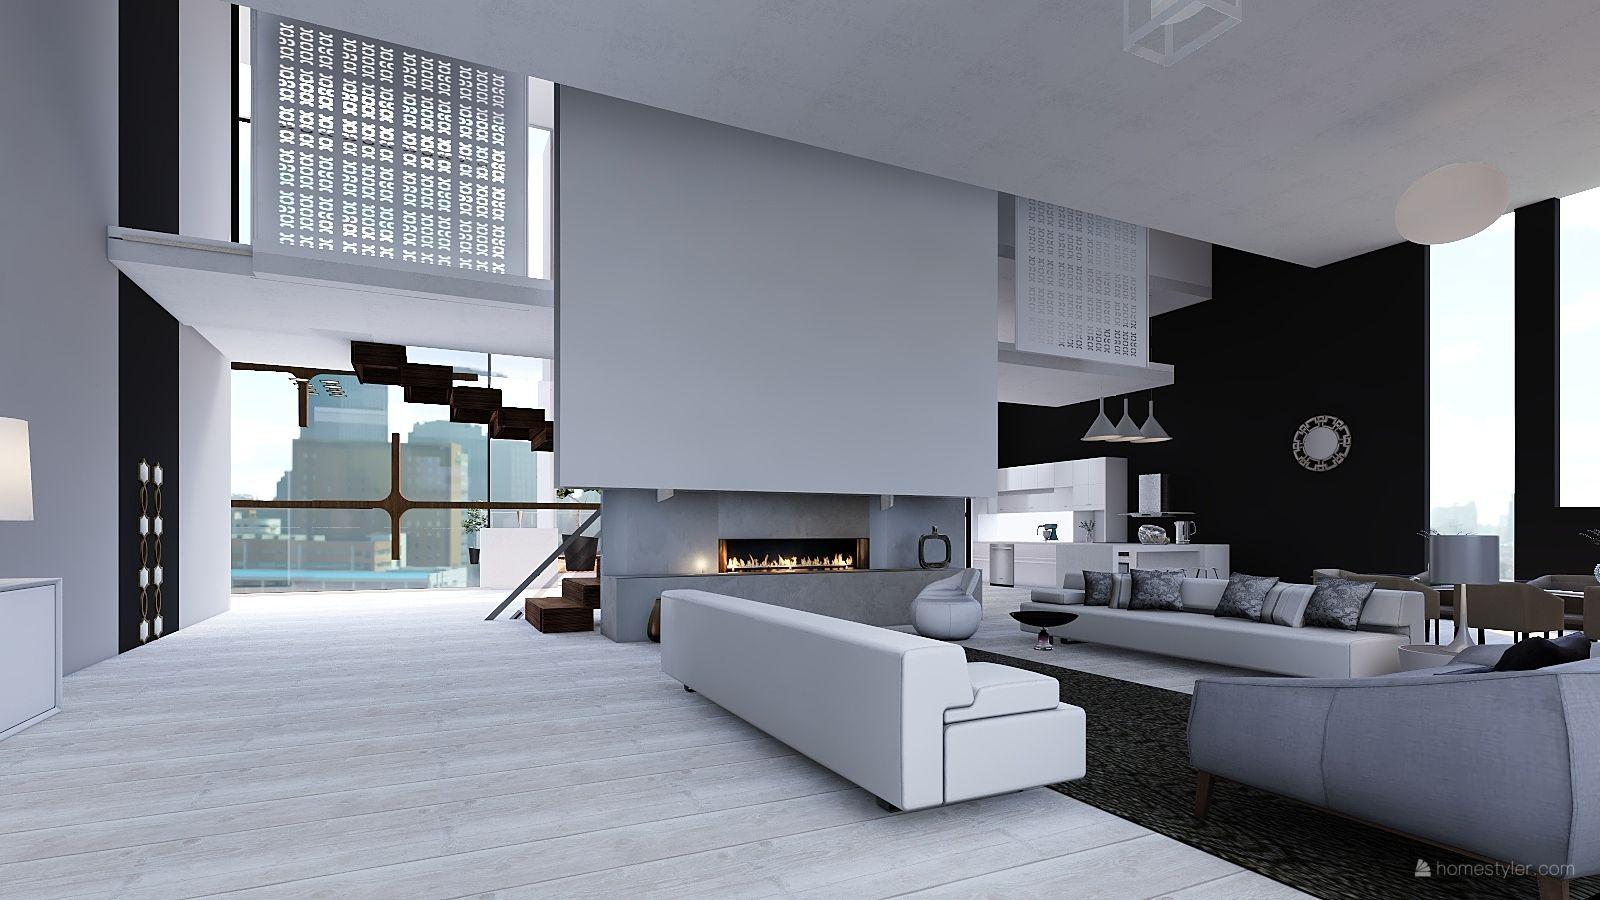 Living Room Design By Madeleine Interiordesign Homedecor 3d Home Design Software Home Design Software Online Home Design